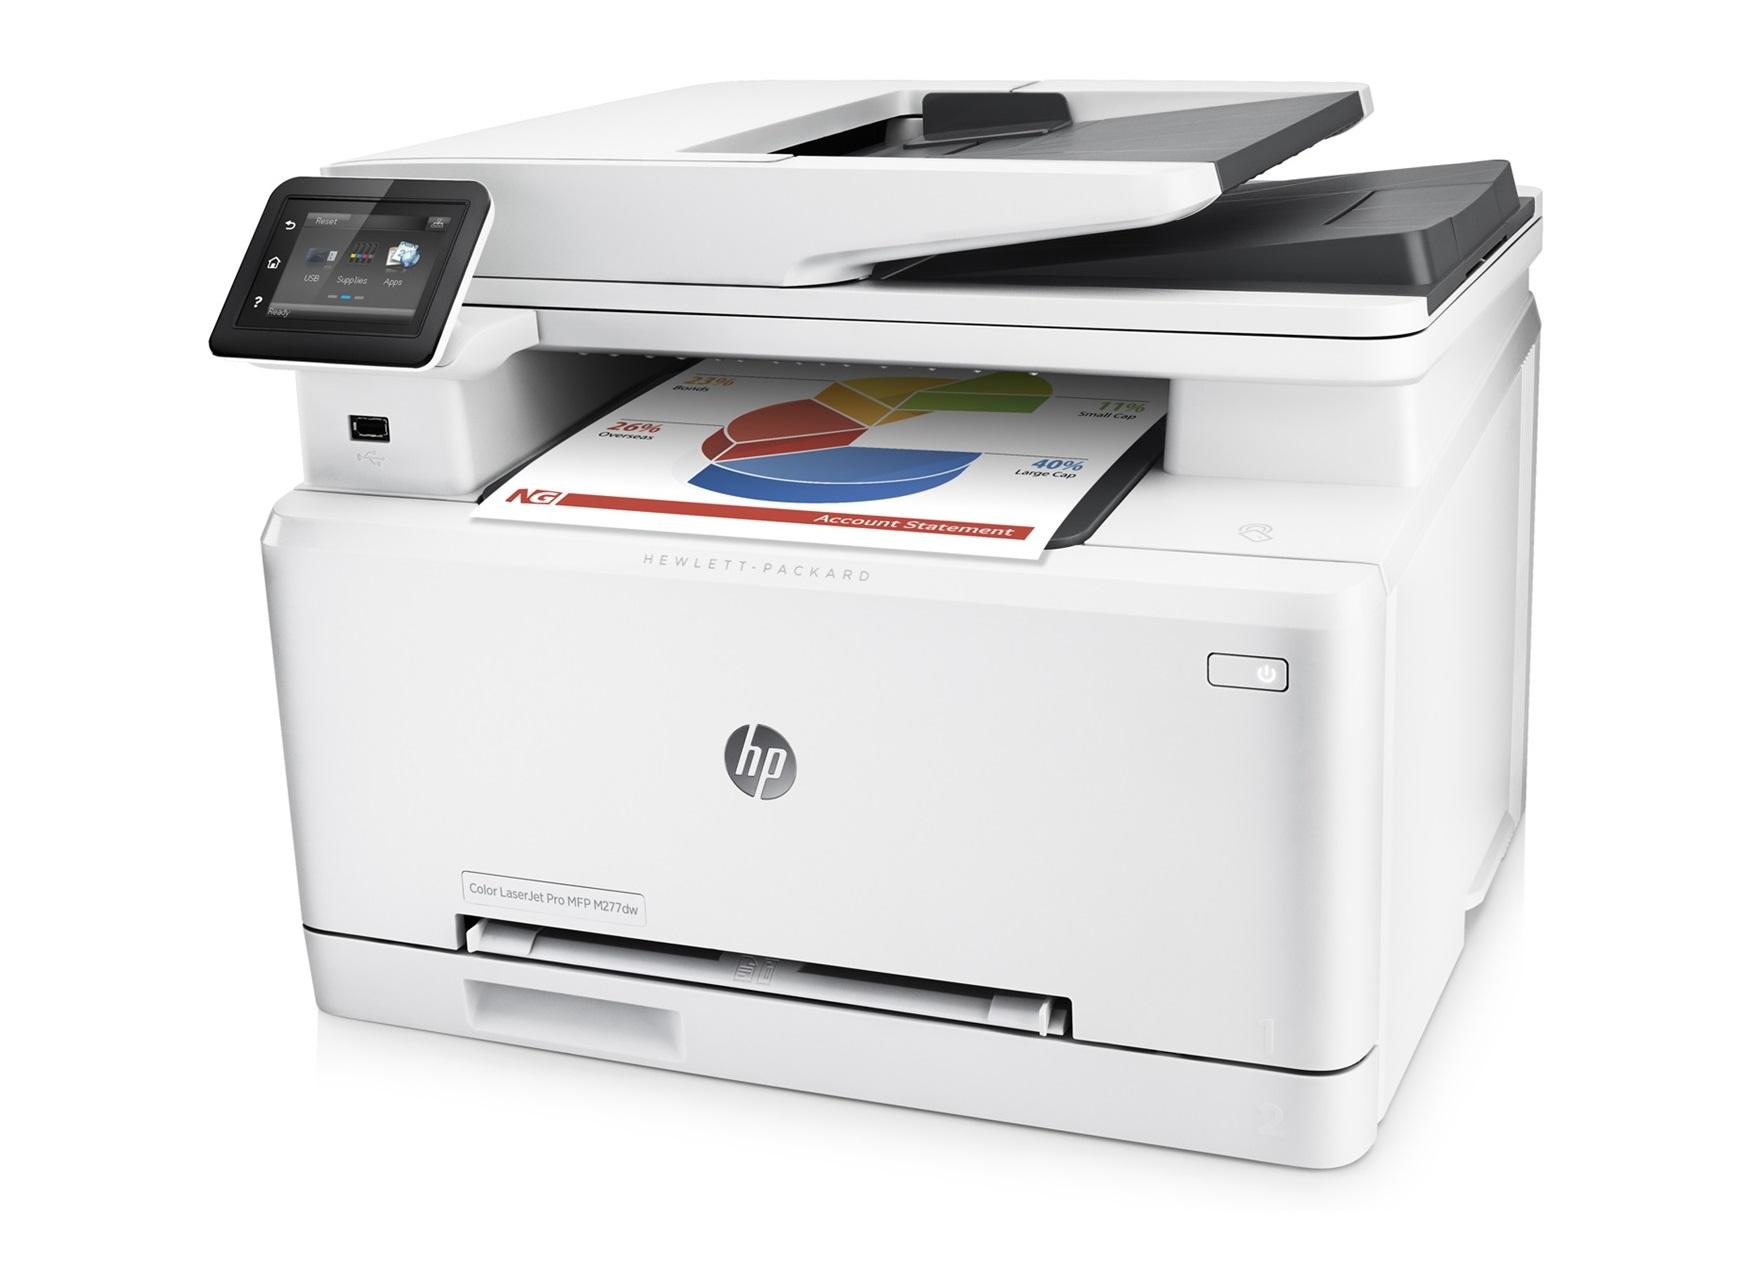 Color printer wireless - Hp Laserjet Pro M277dw Color Wireless